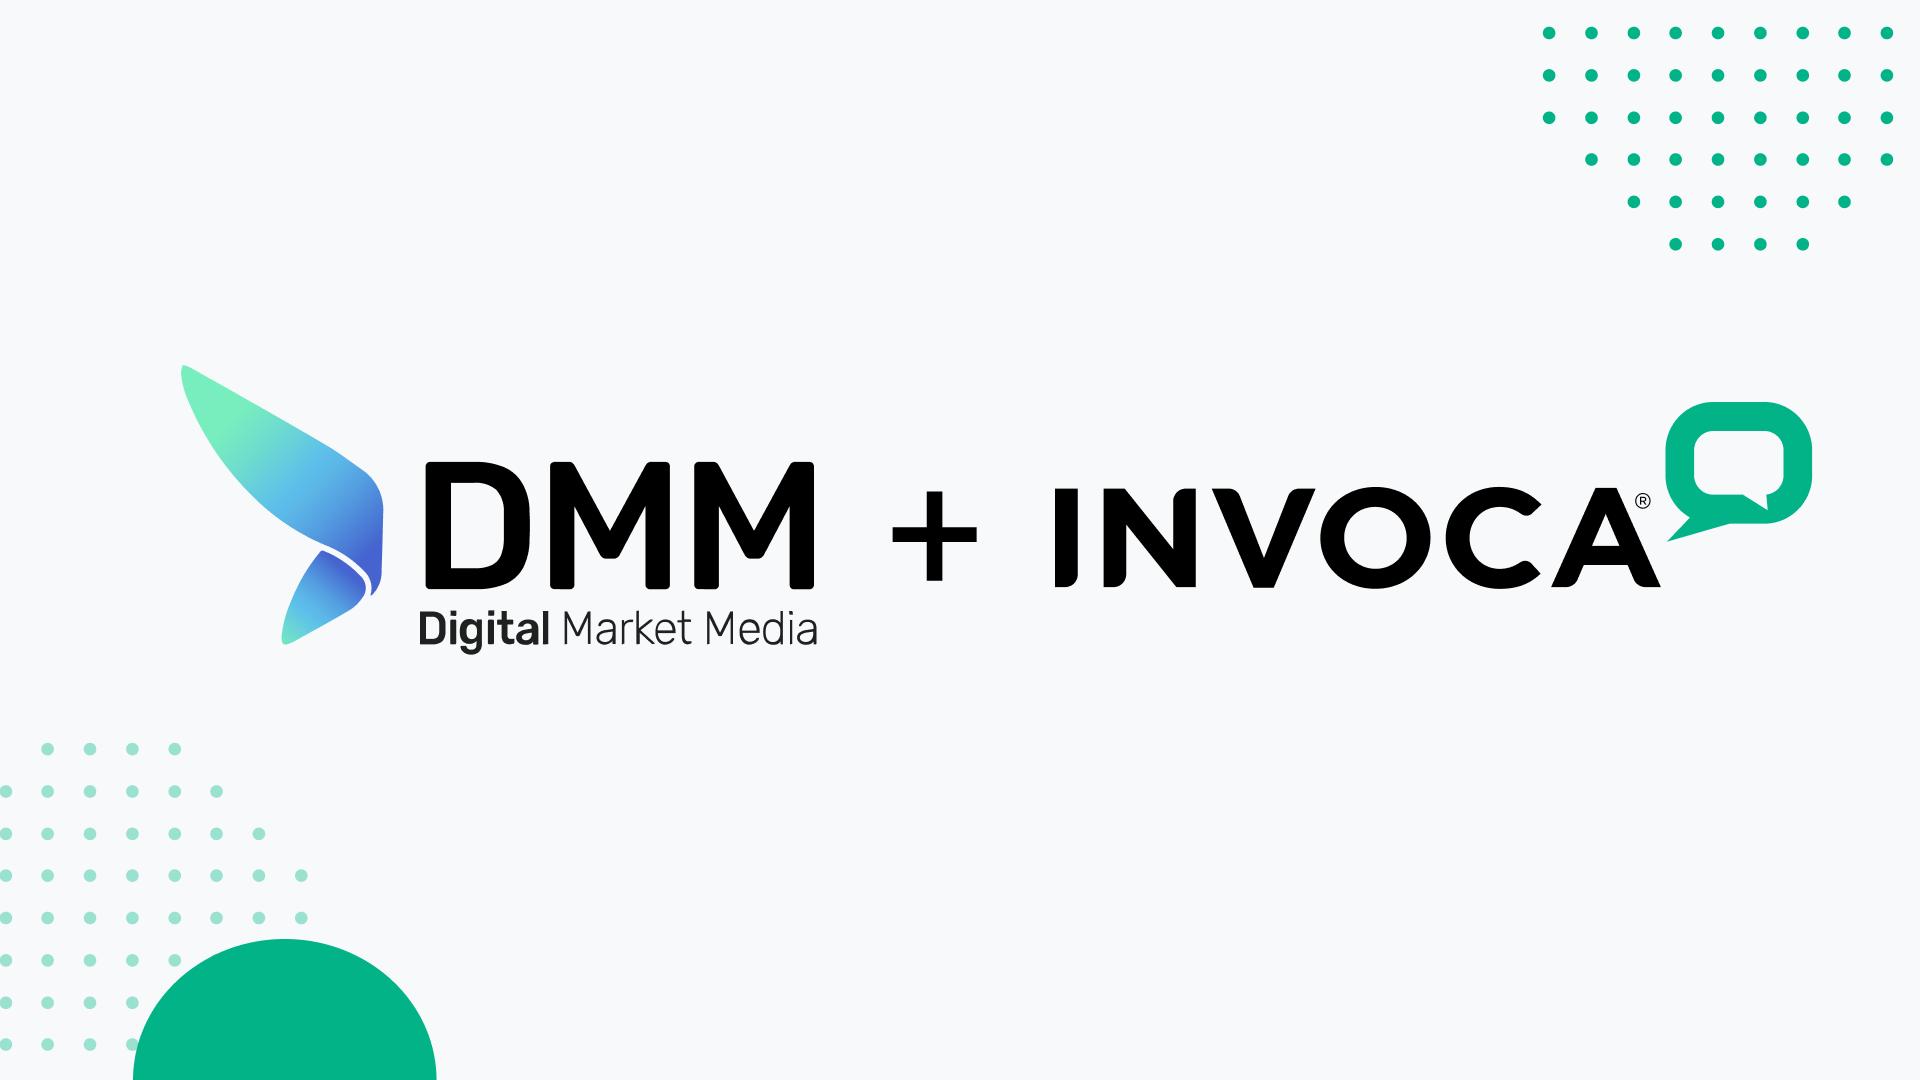 See How Digital Market Media Drove 1,000% More YoY Revenue With Invoca